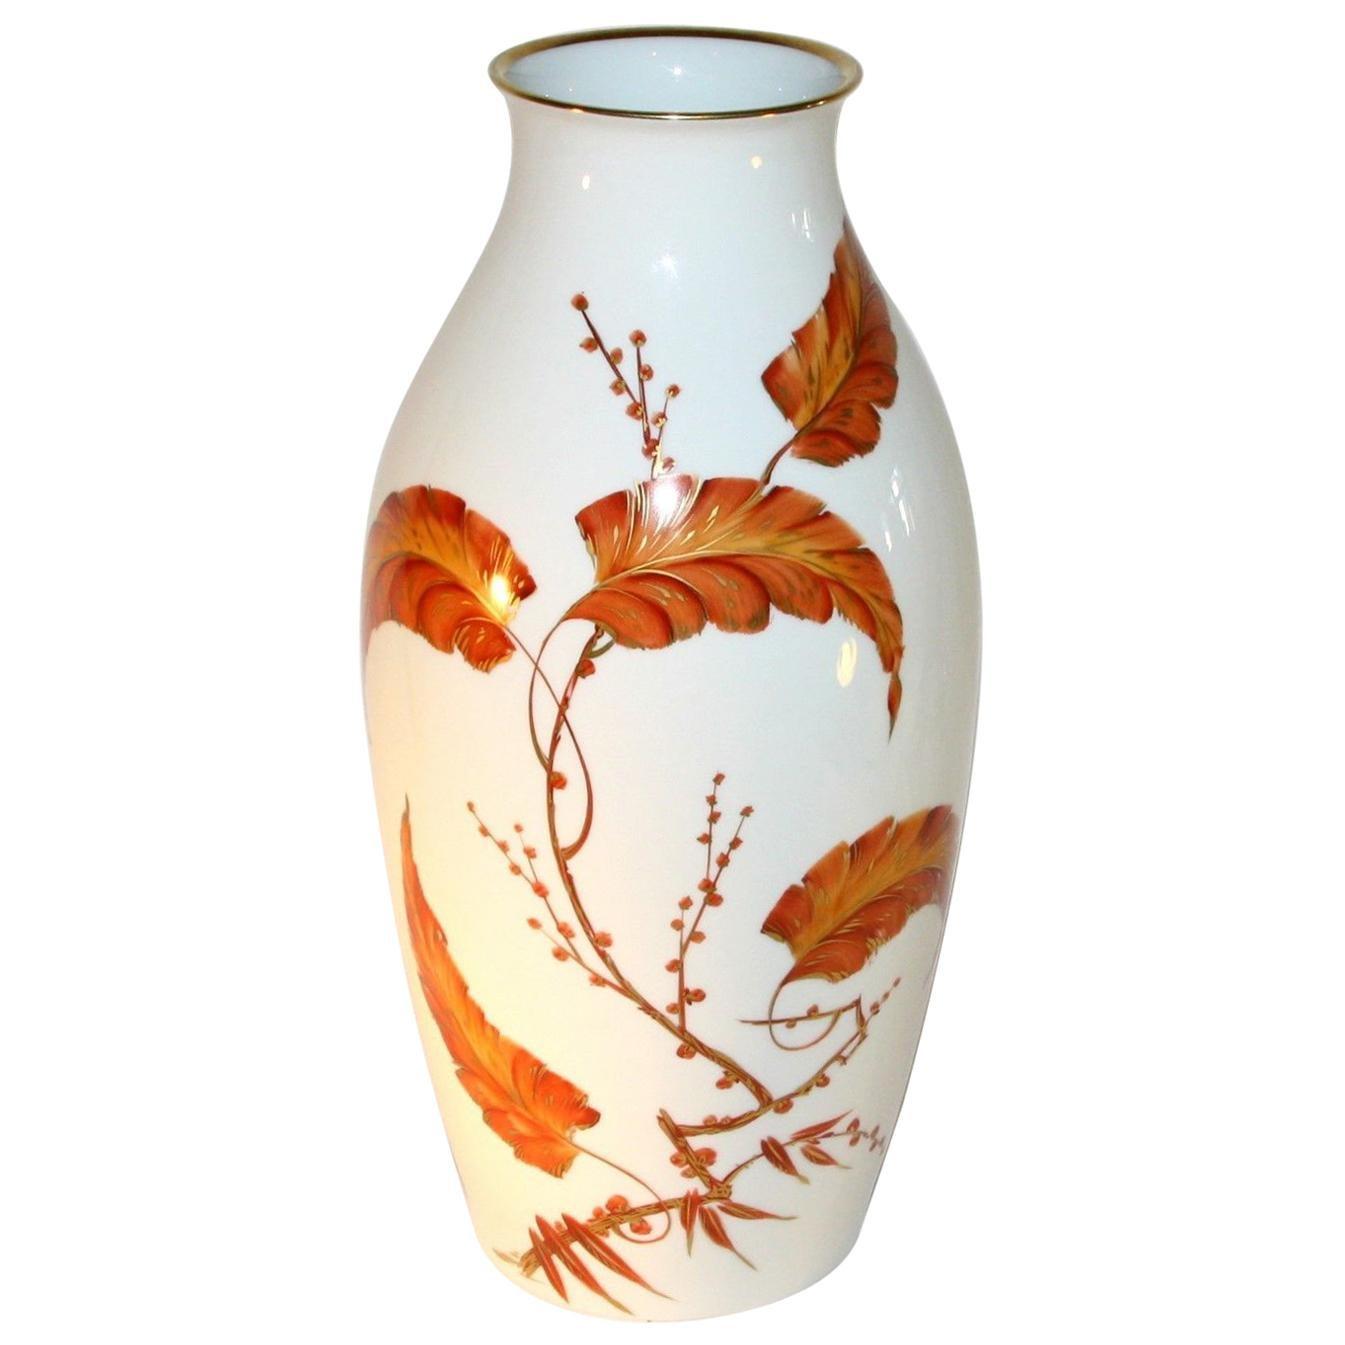 Art Deco Huge Rosenthal Vase Porcelain with Floral Hand Paintings